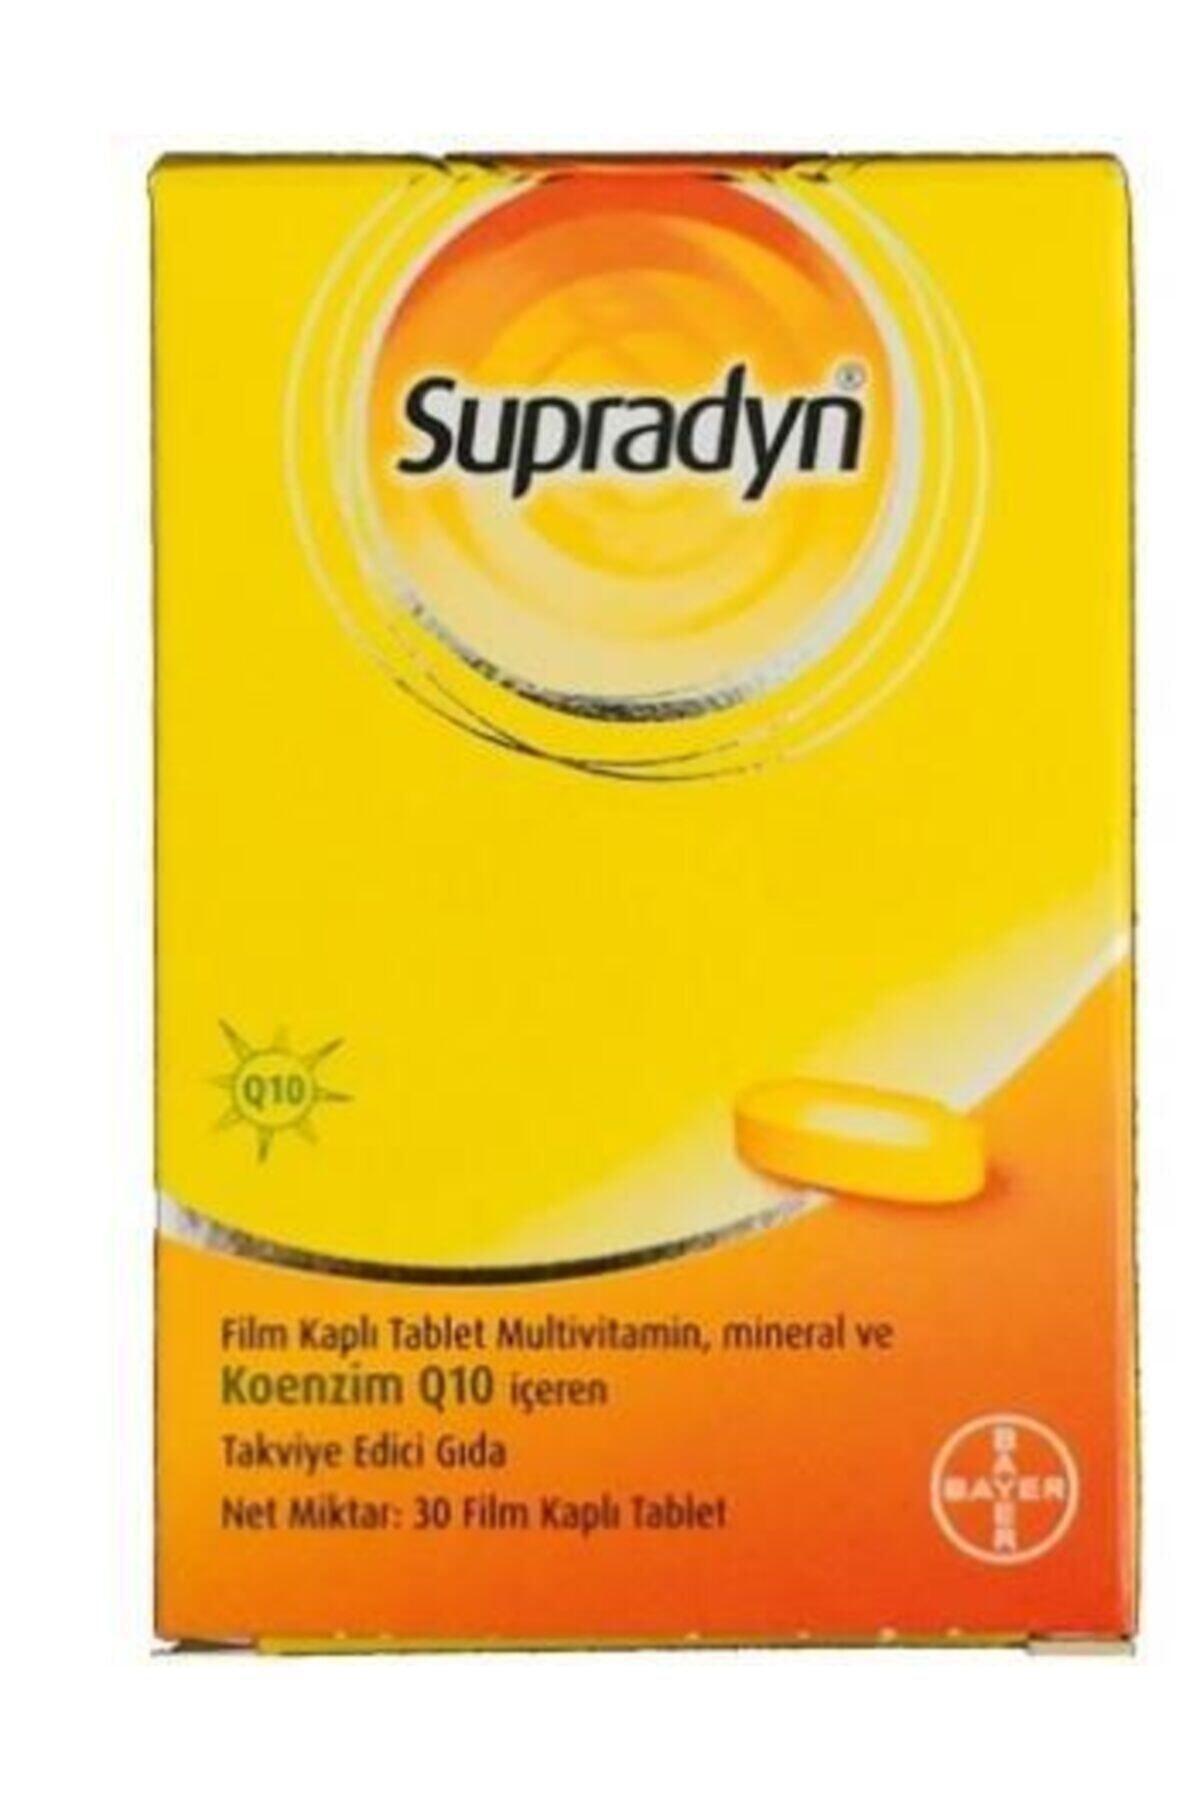 Supradyn Koenzym Q10 - 30 Tablet 1